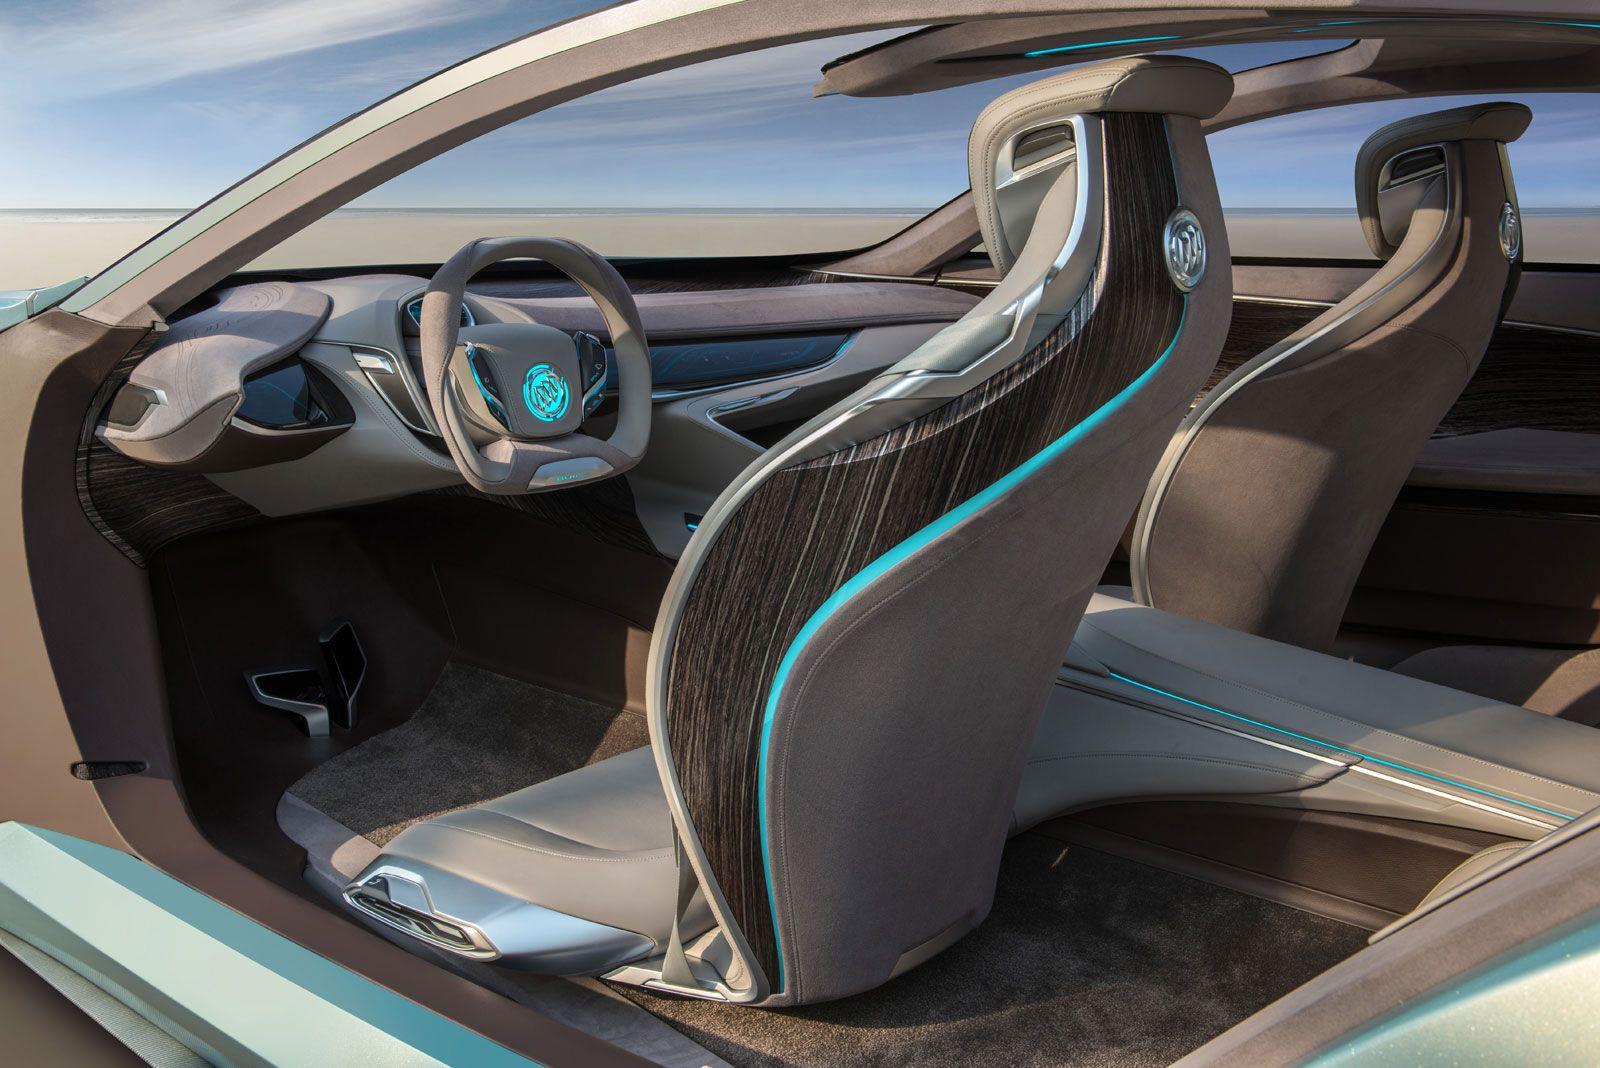 2013 buick riviera concepts